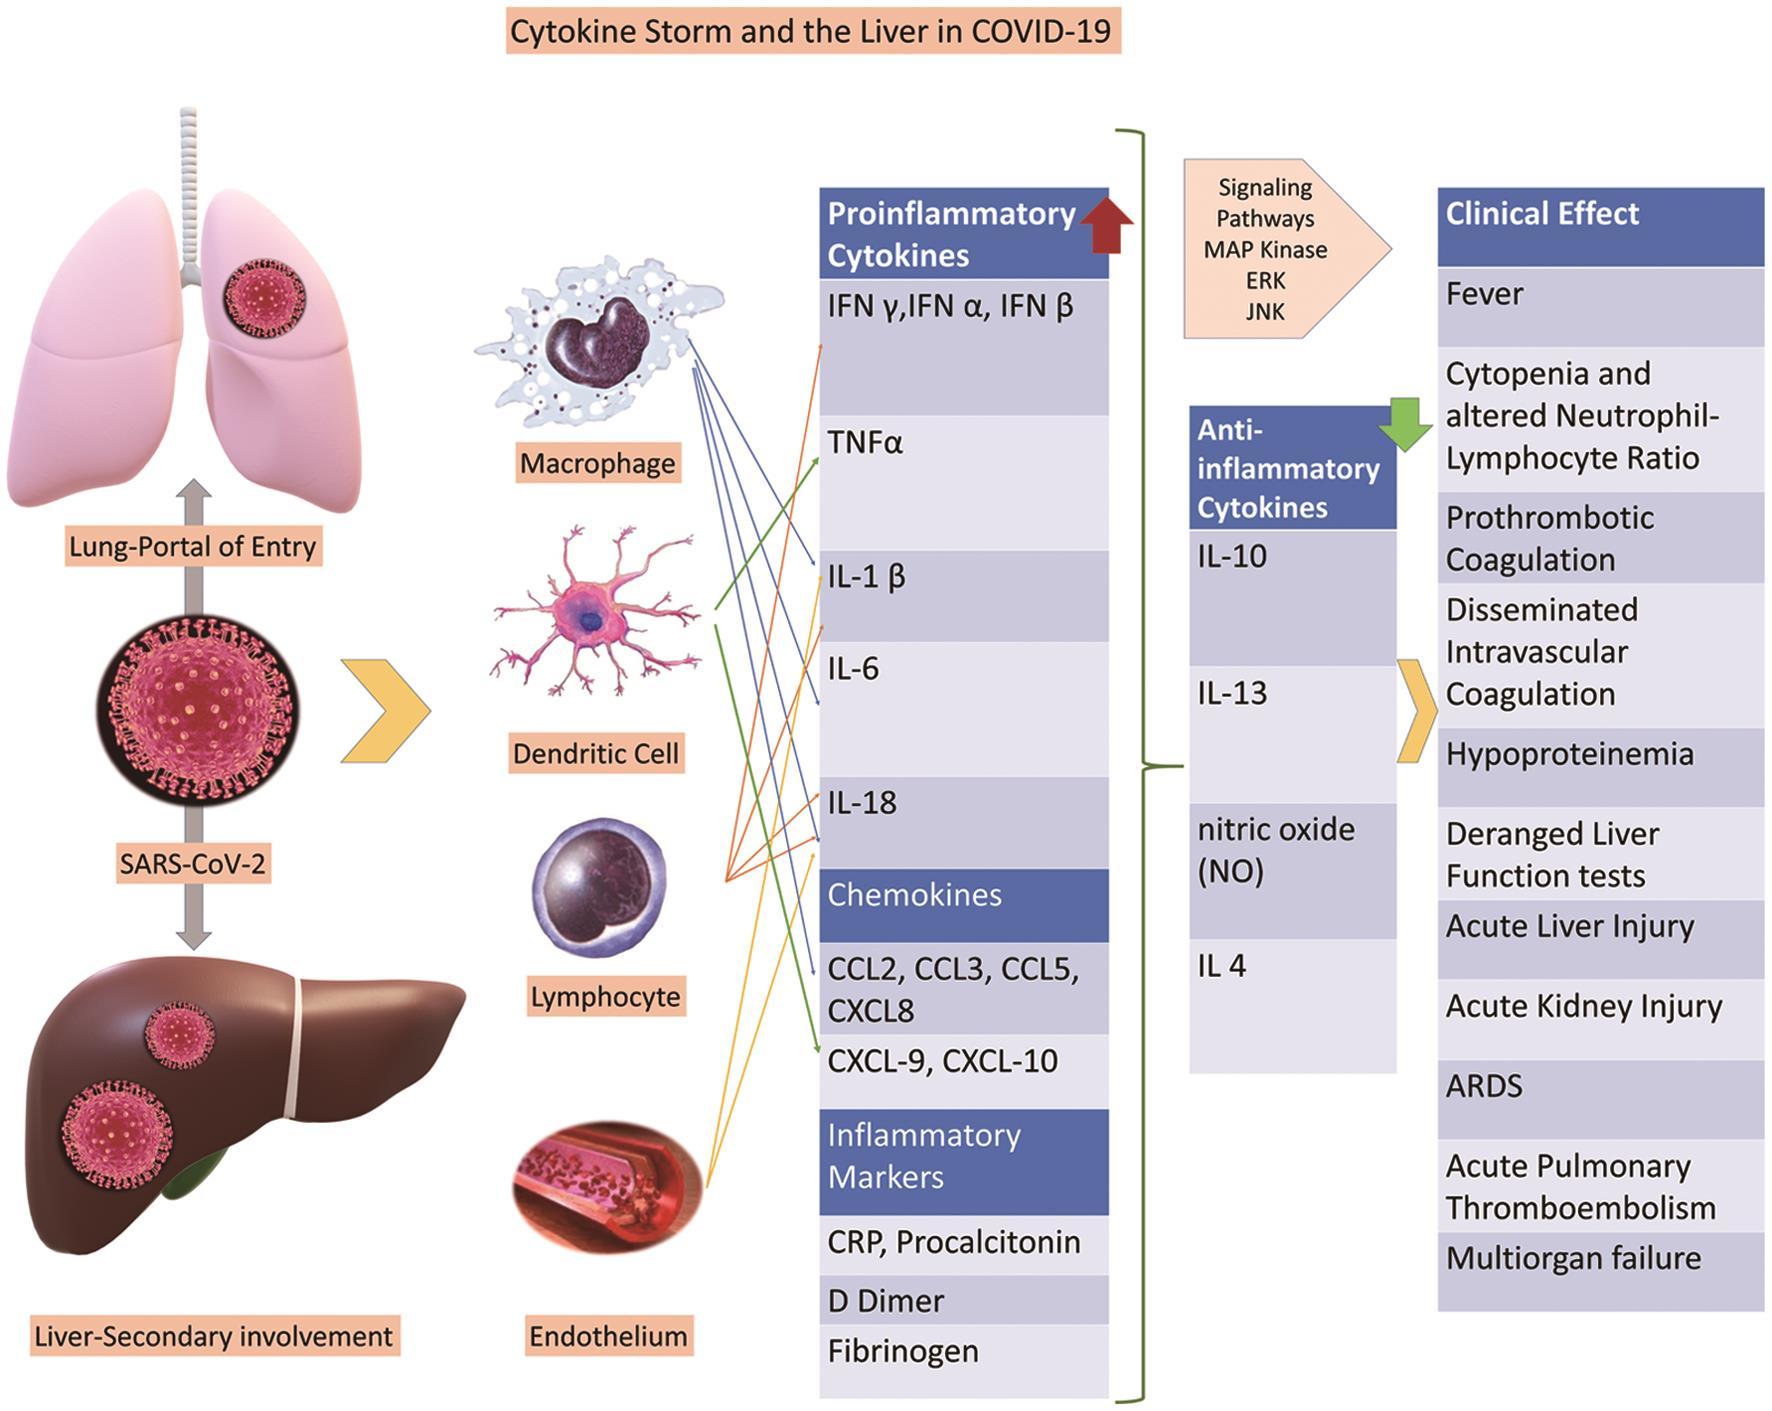 COVID-19, cytokine storm and immune-mediated organ failure.